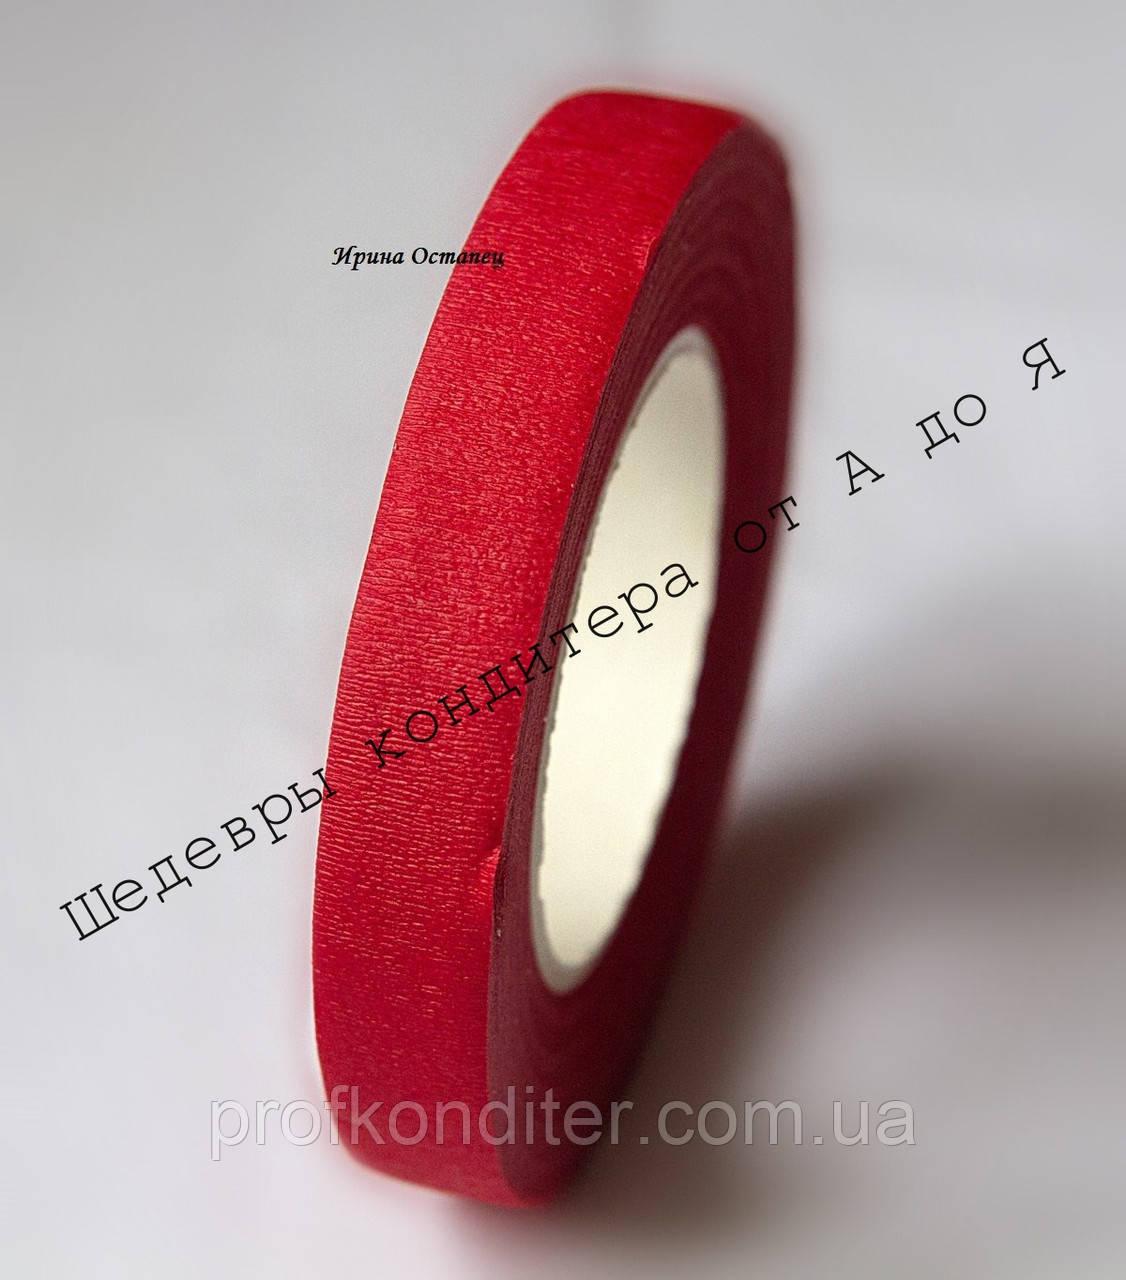 Тейп-лента Красная